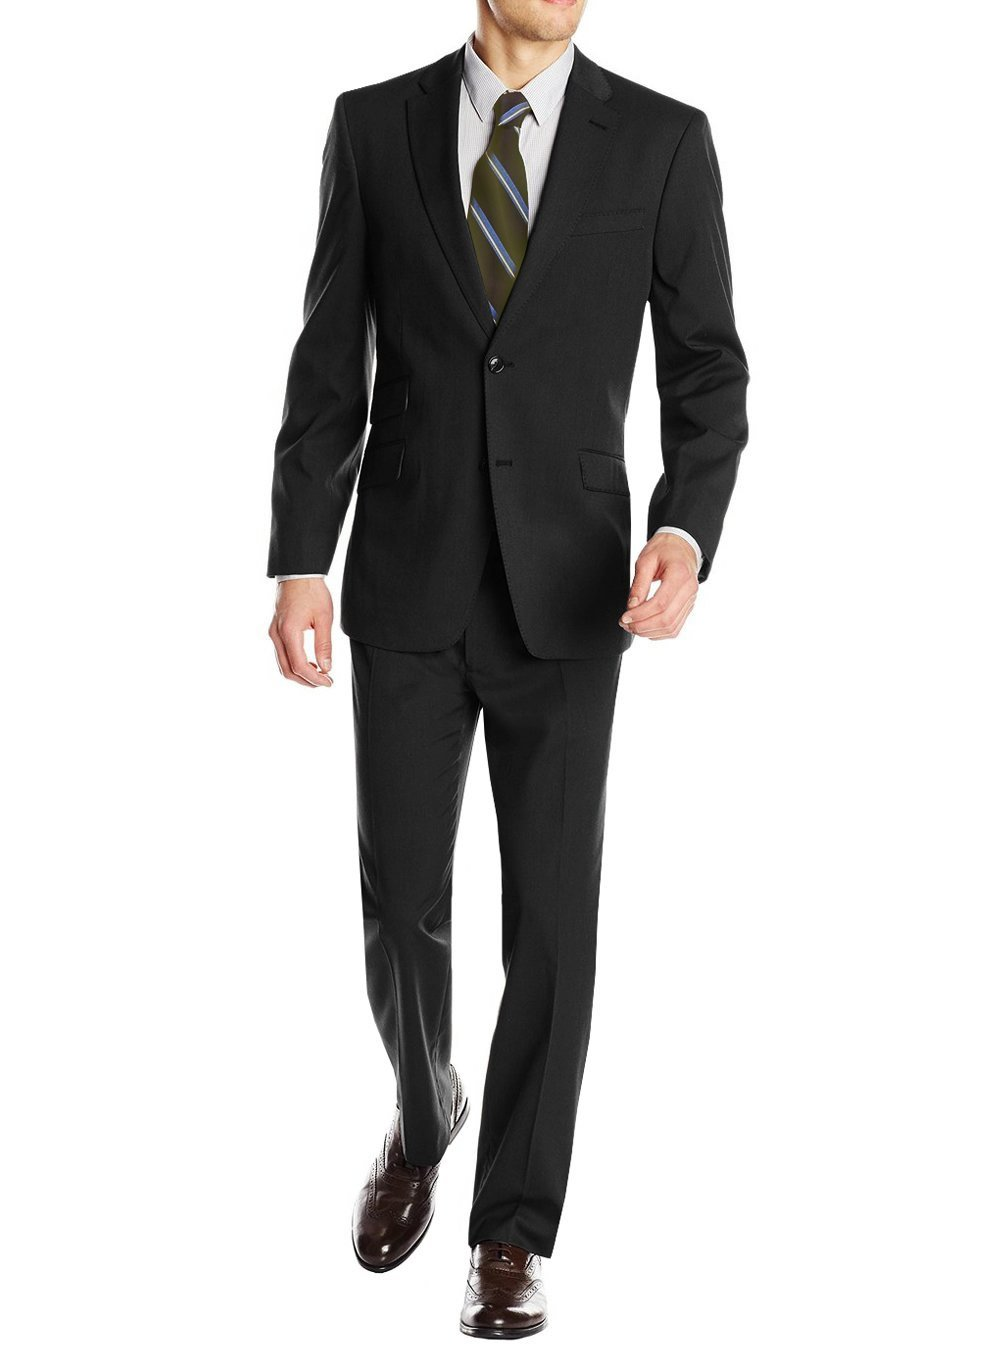 Gino Valentino Men's 2 Piece Two Button Ticket Pocket Jacket Faint Herringbone Suit (42 Regular US / 52R EU / W 36'', Black)